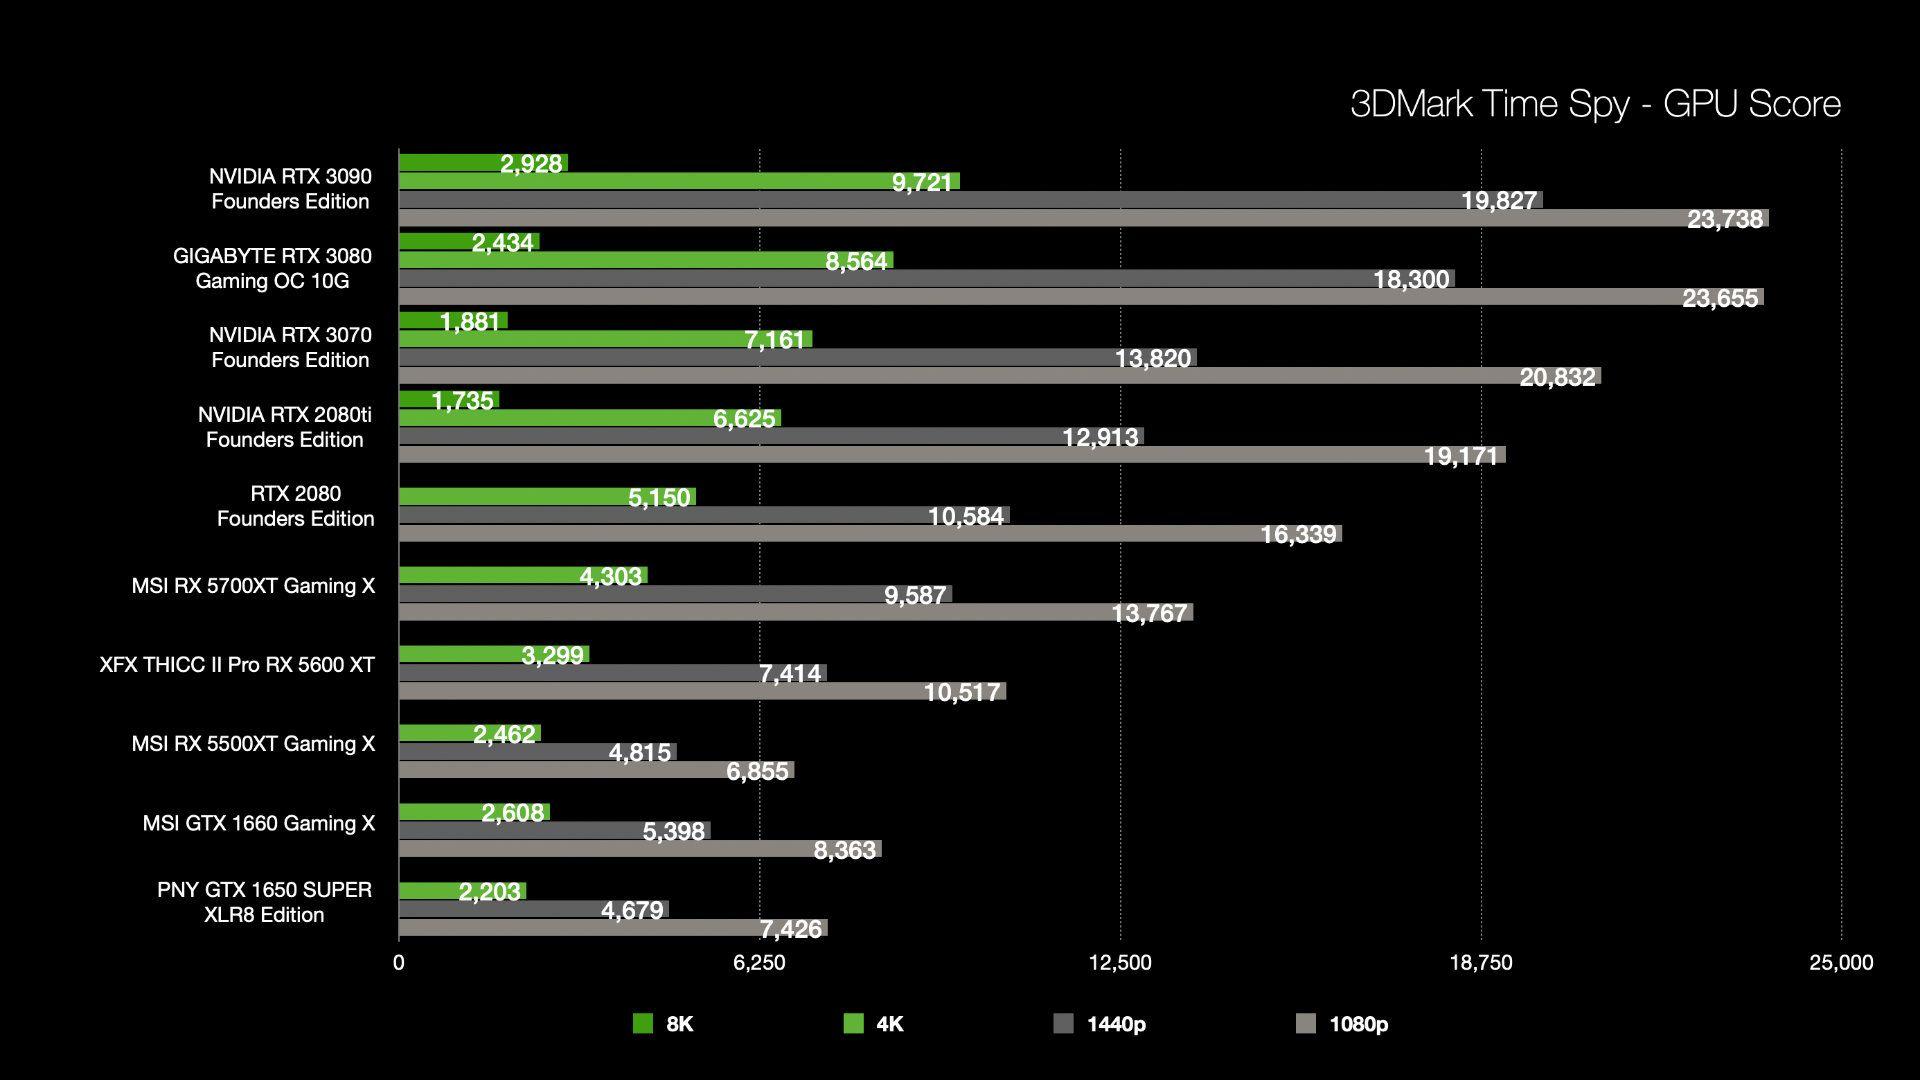 3DMark Time Spy results